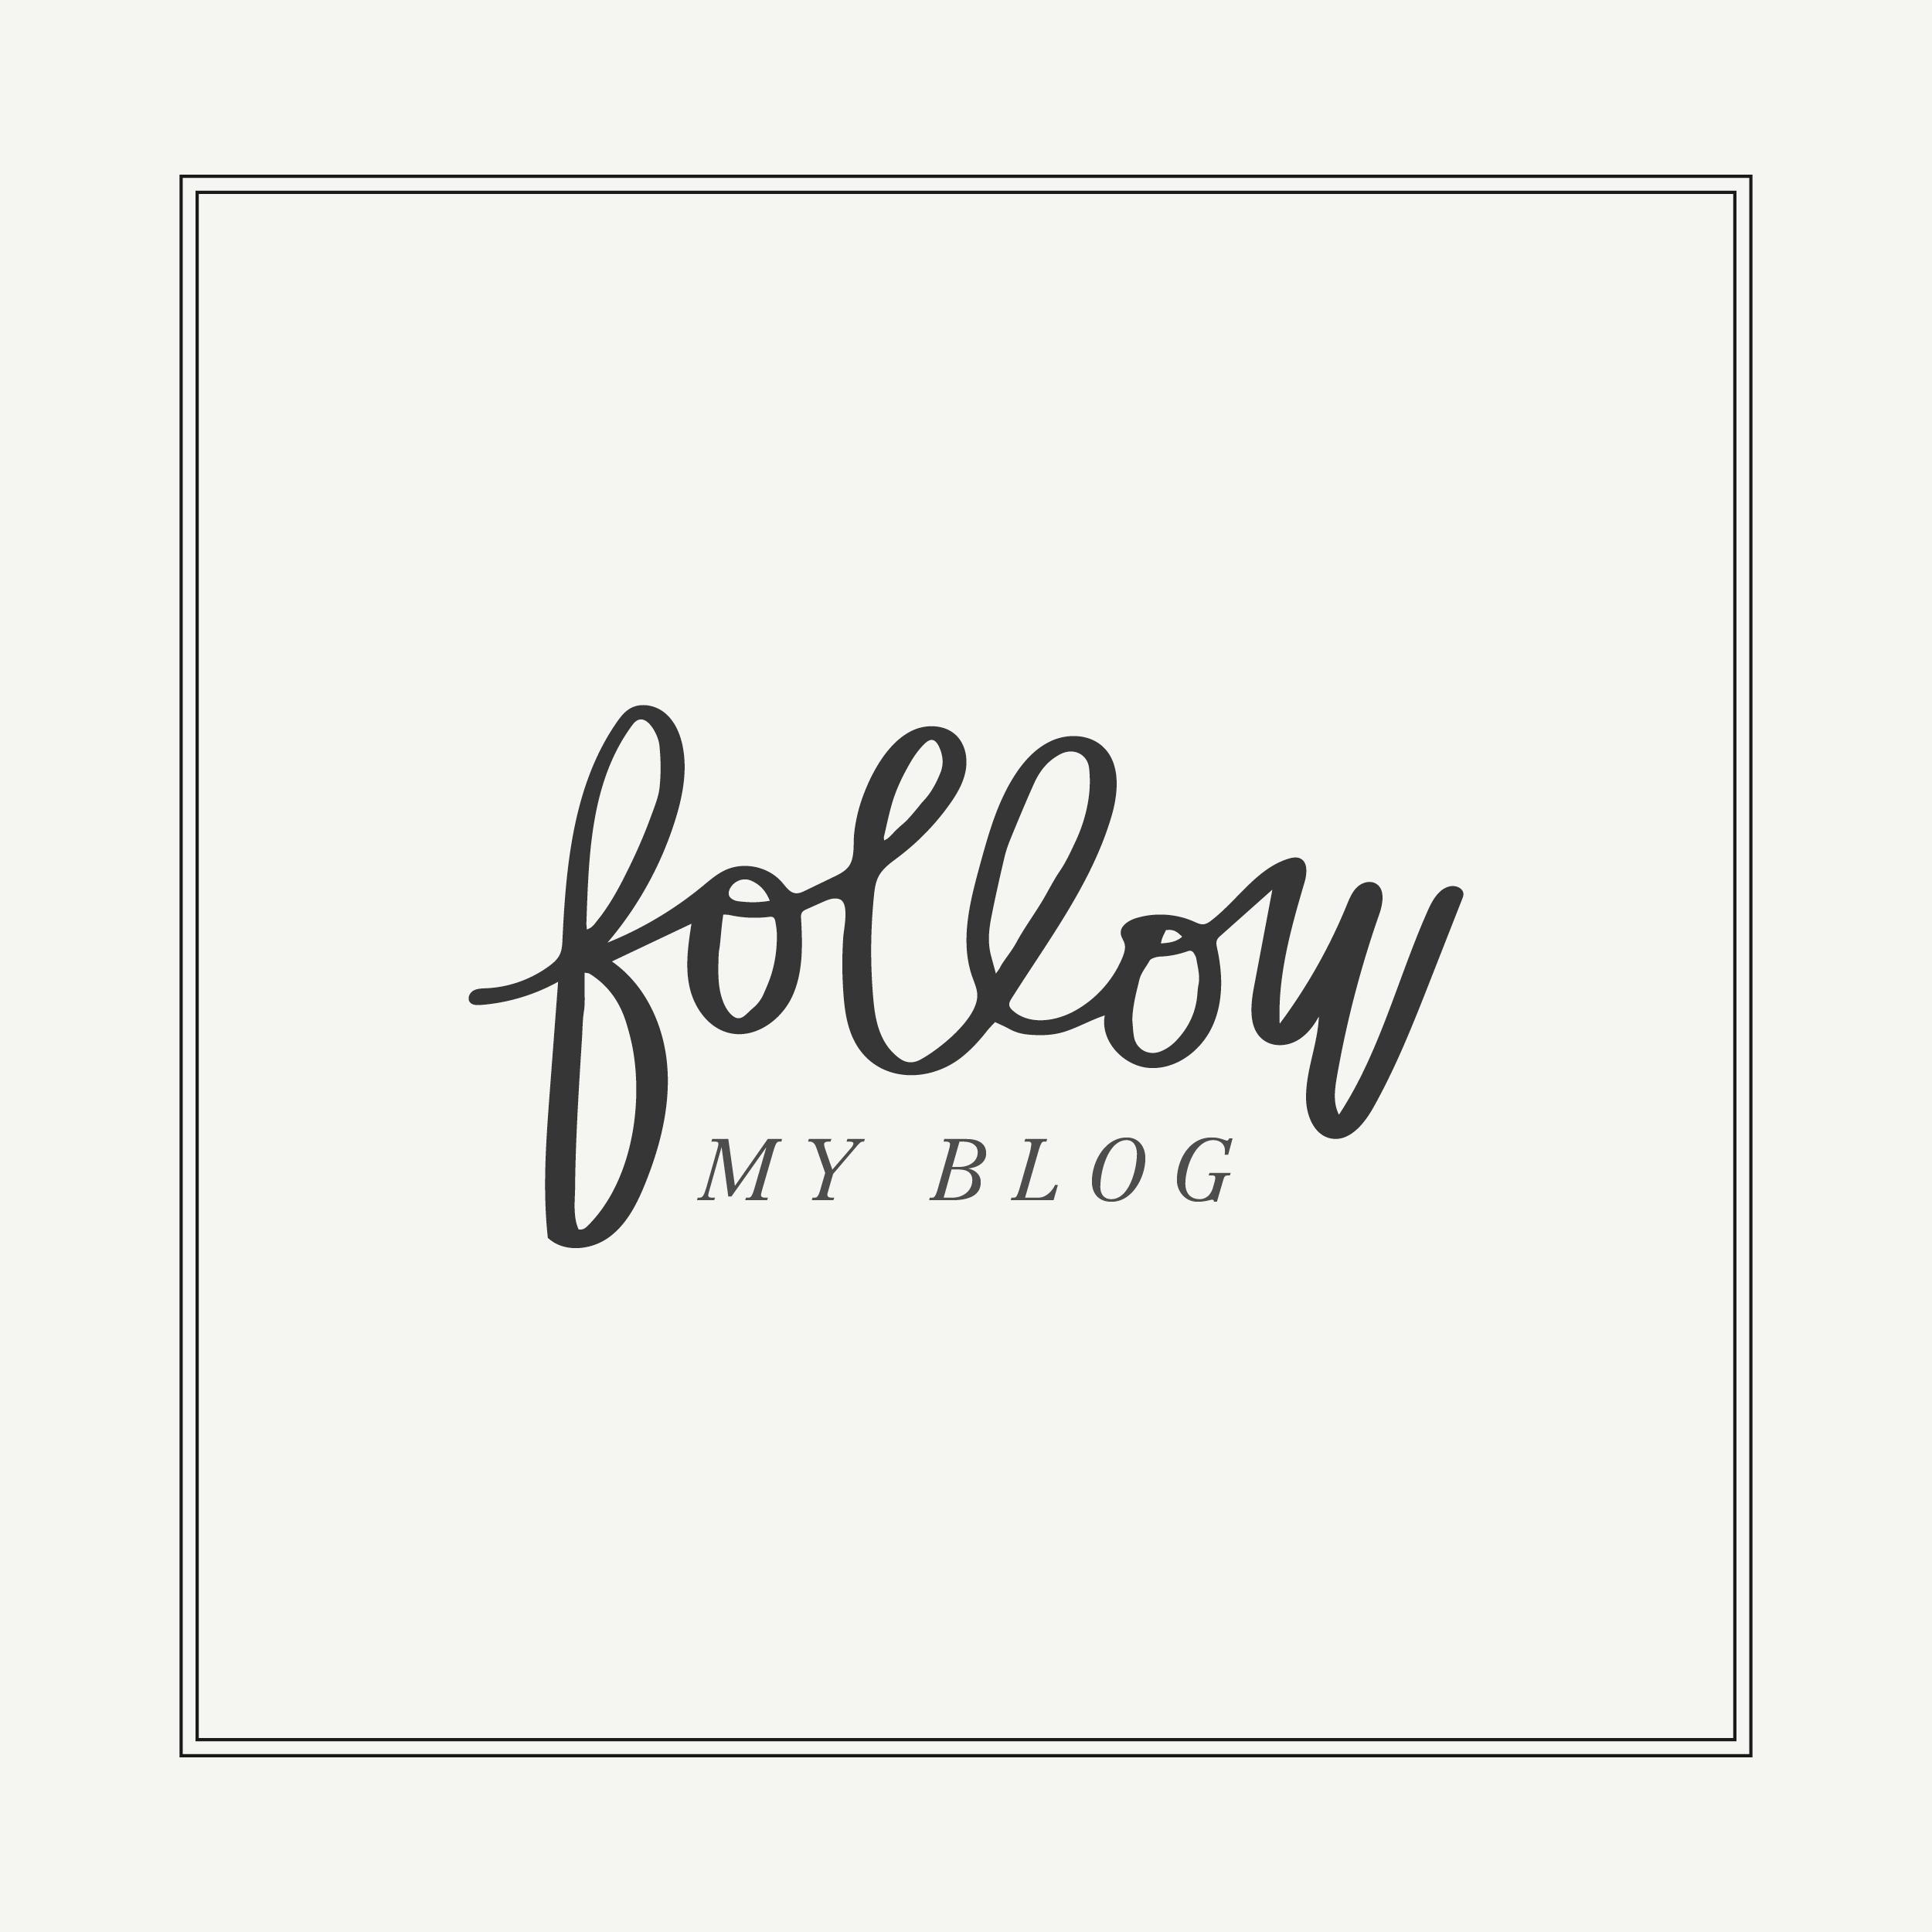 followmyblog.png